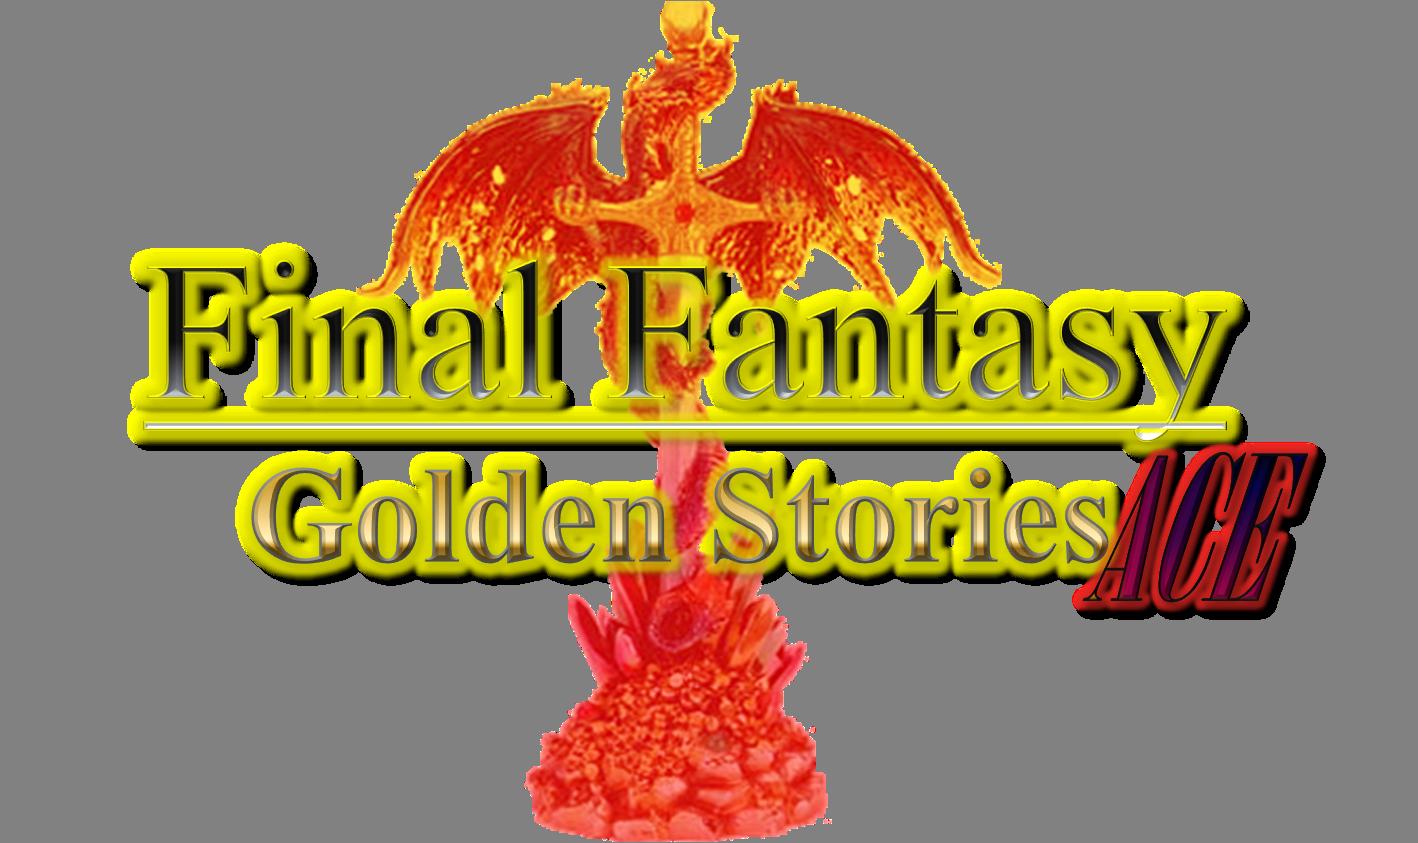 Final Fantasy Golden Stories Ace